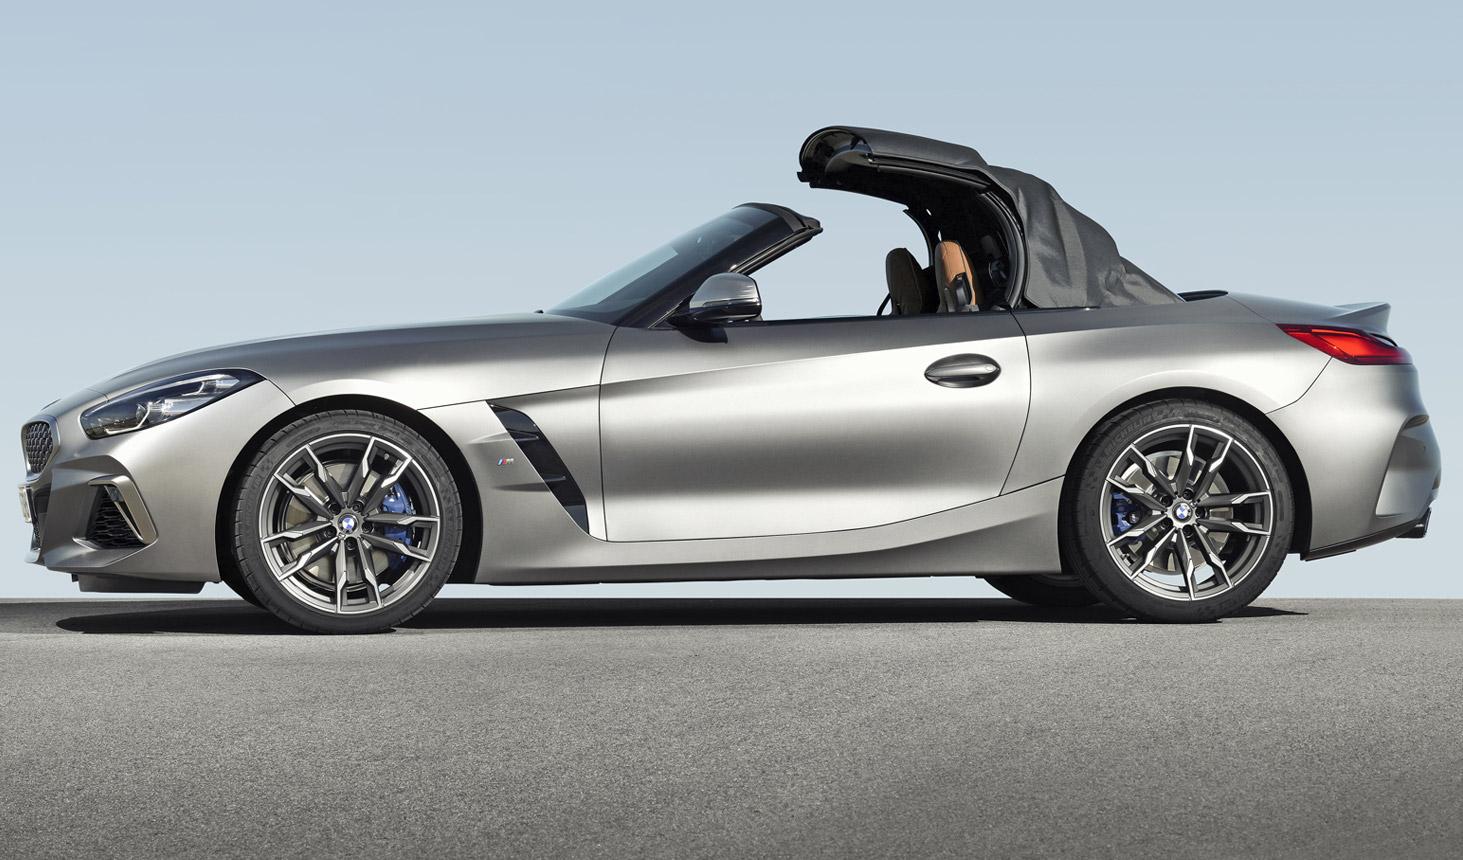 2-fiche-occasion-BMW-Z4-G29-fiabilite-guide-achat.jpg